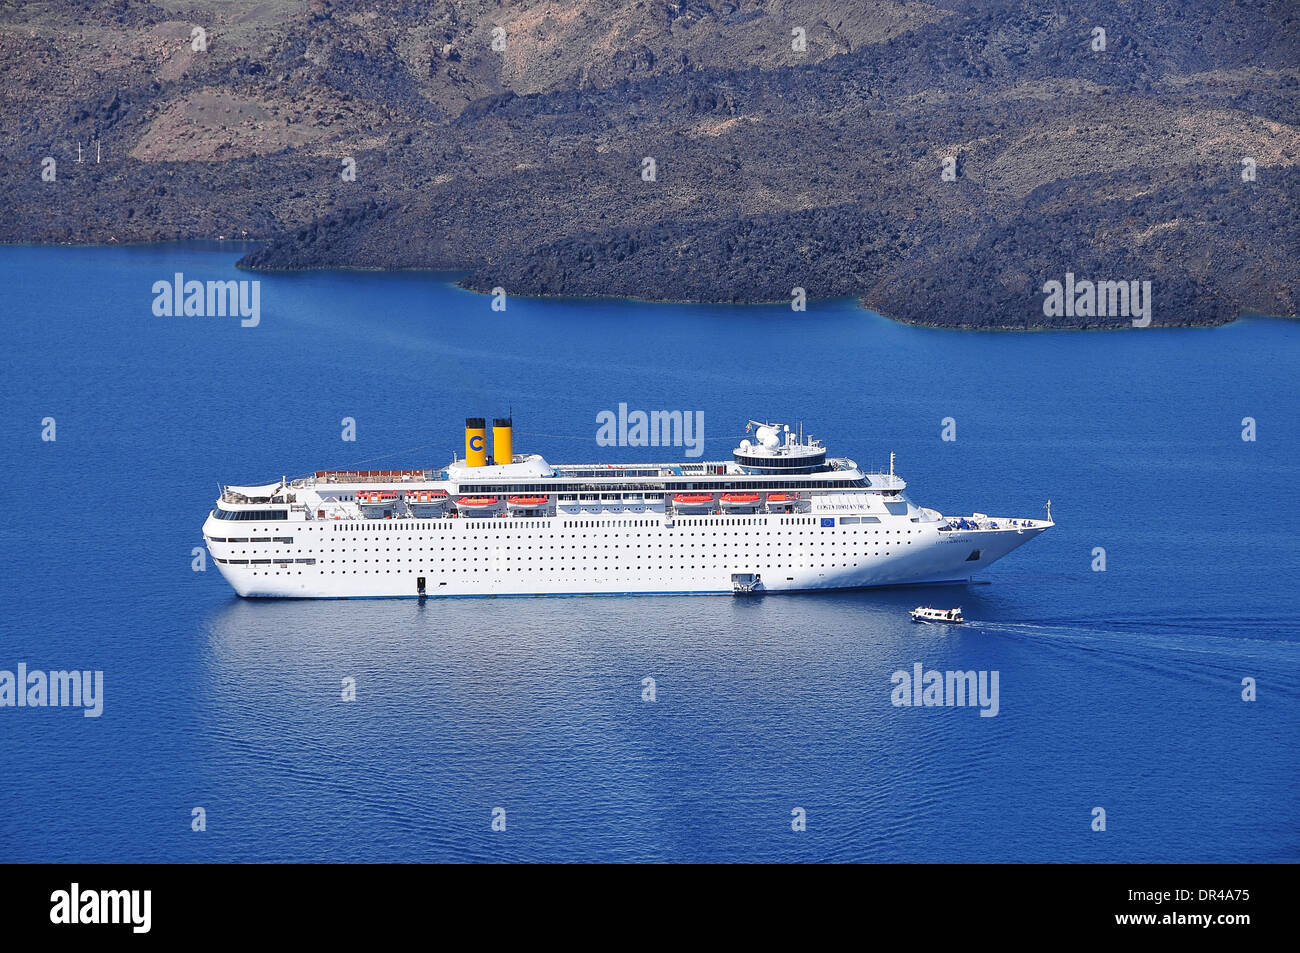 Passenger Vessel in Meditteranian Sea - Stock Image